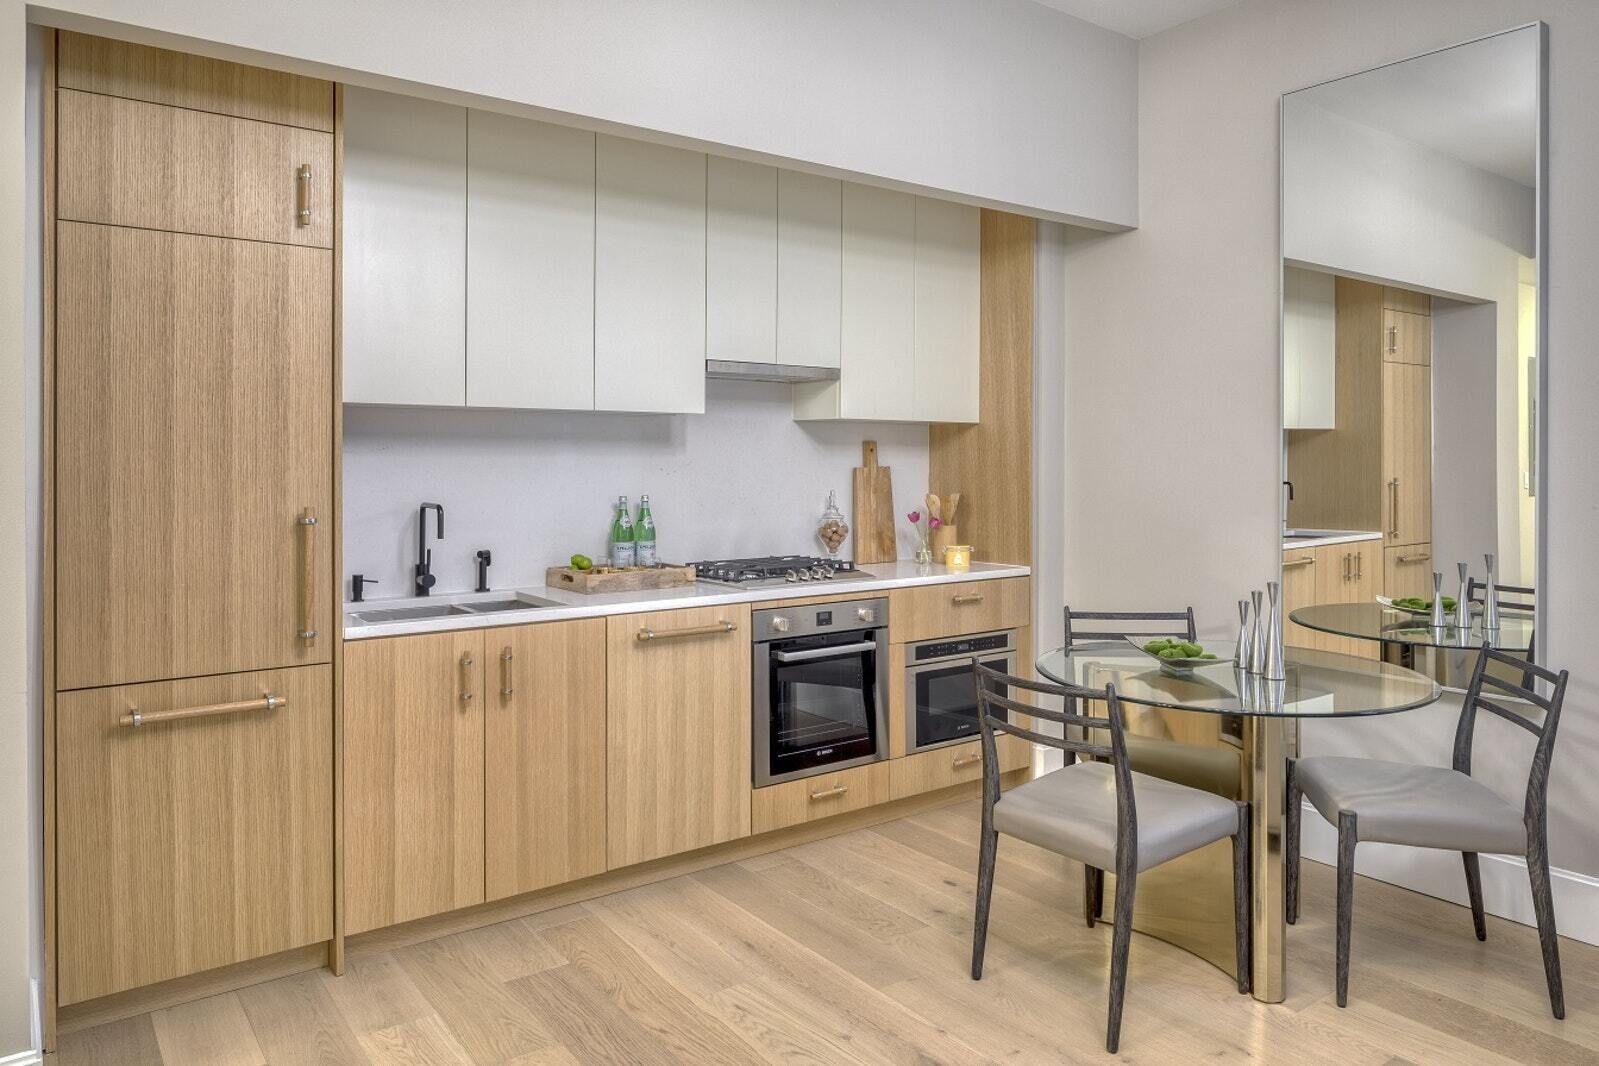 Apartment for sale at 2218 Jackson Avenue, Apt 804